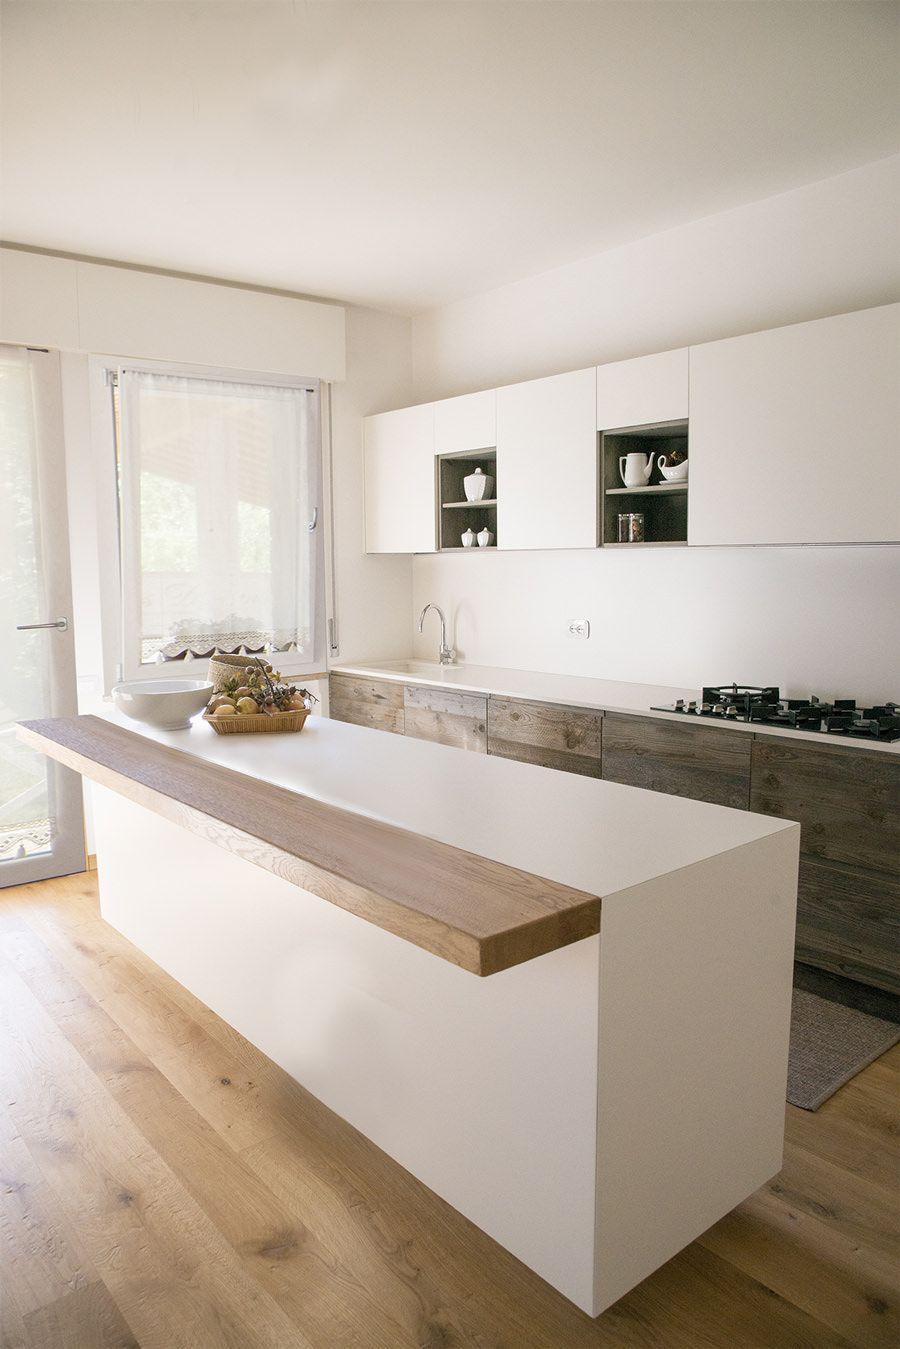 100 idee cucine con isola moderne e funzionali cucina for Decorazioni cucine moderne